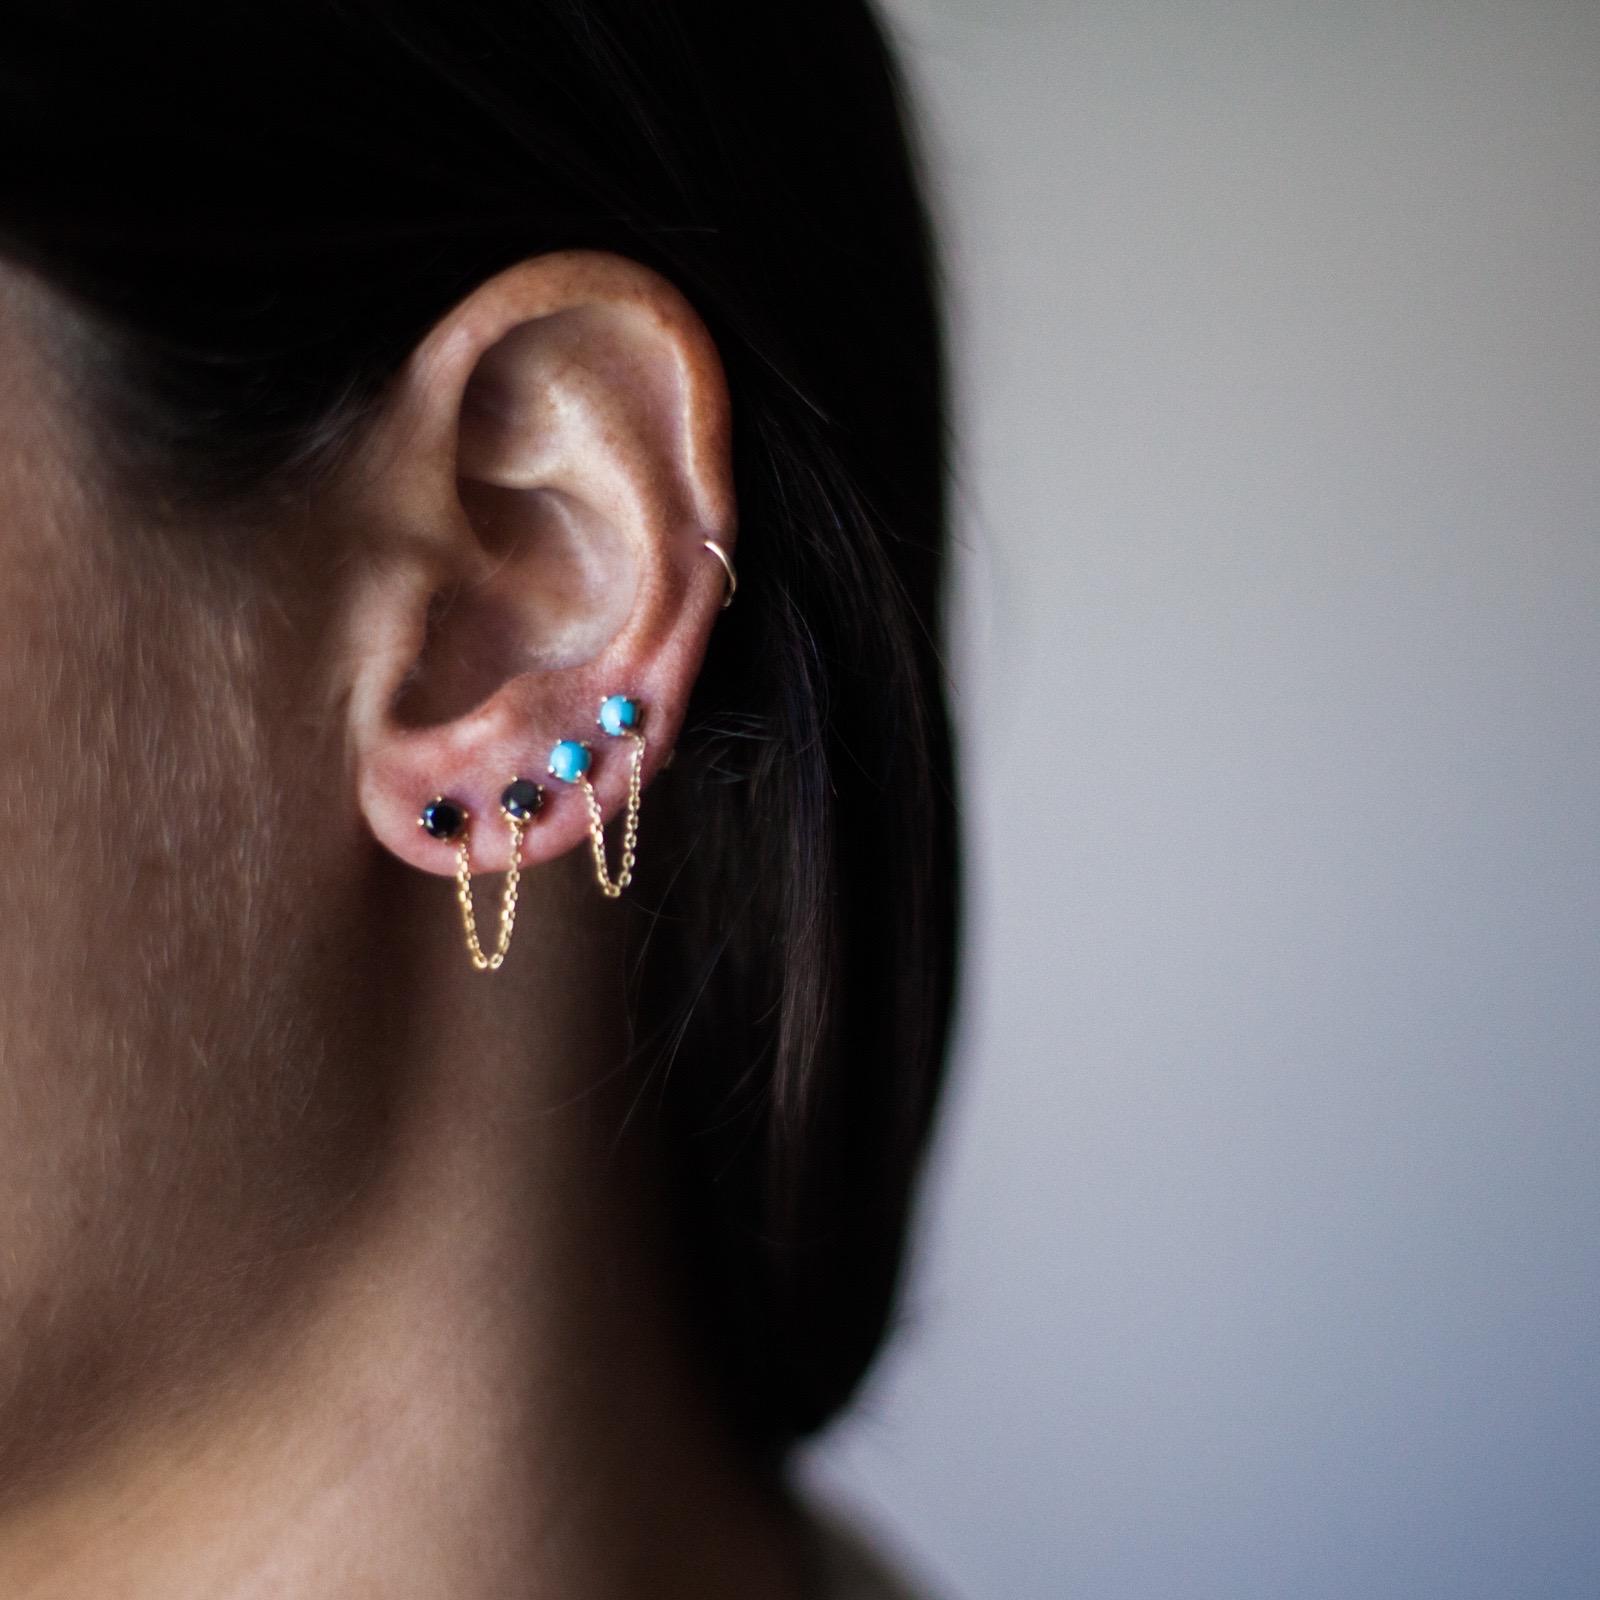 chain earrings 1.jpg